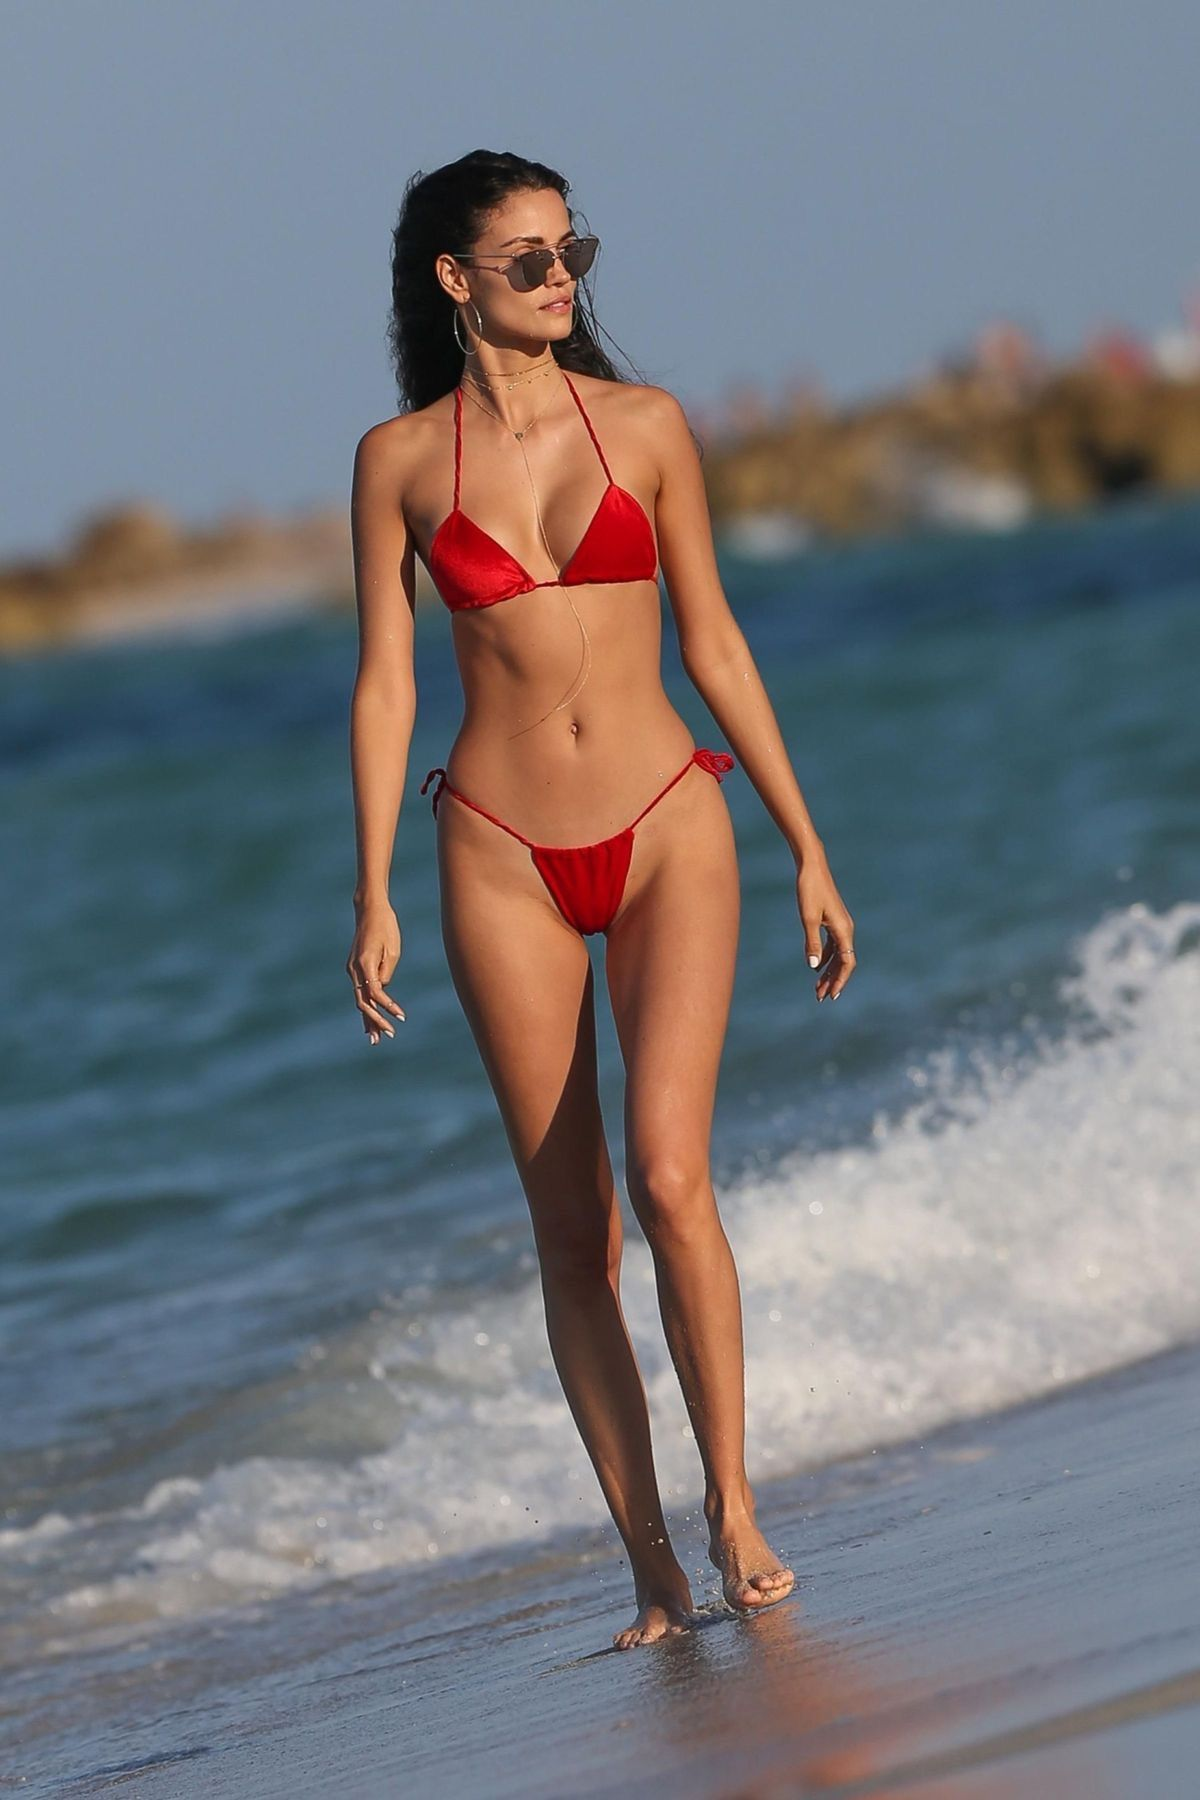 Bikini Samy Jordan naked (17 foto and video), Tits, Paparazzi, Boobs, lingerie 2020